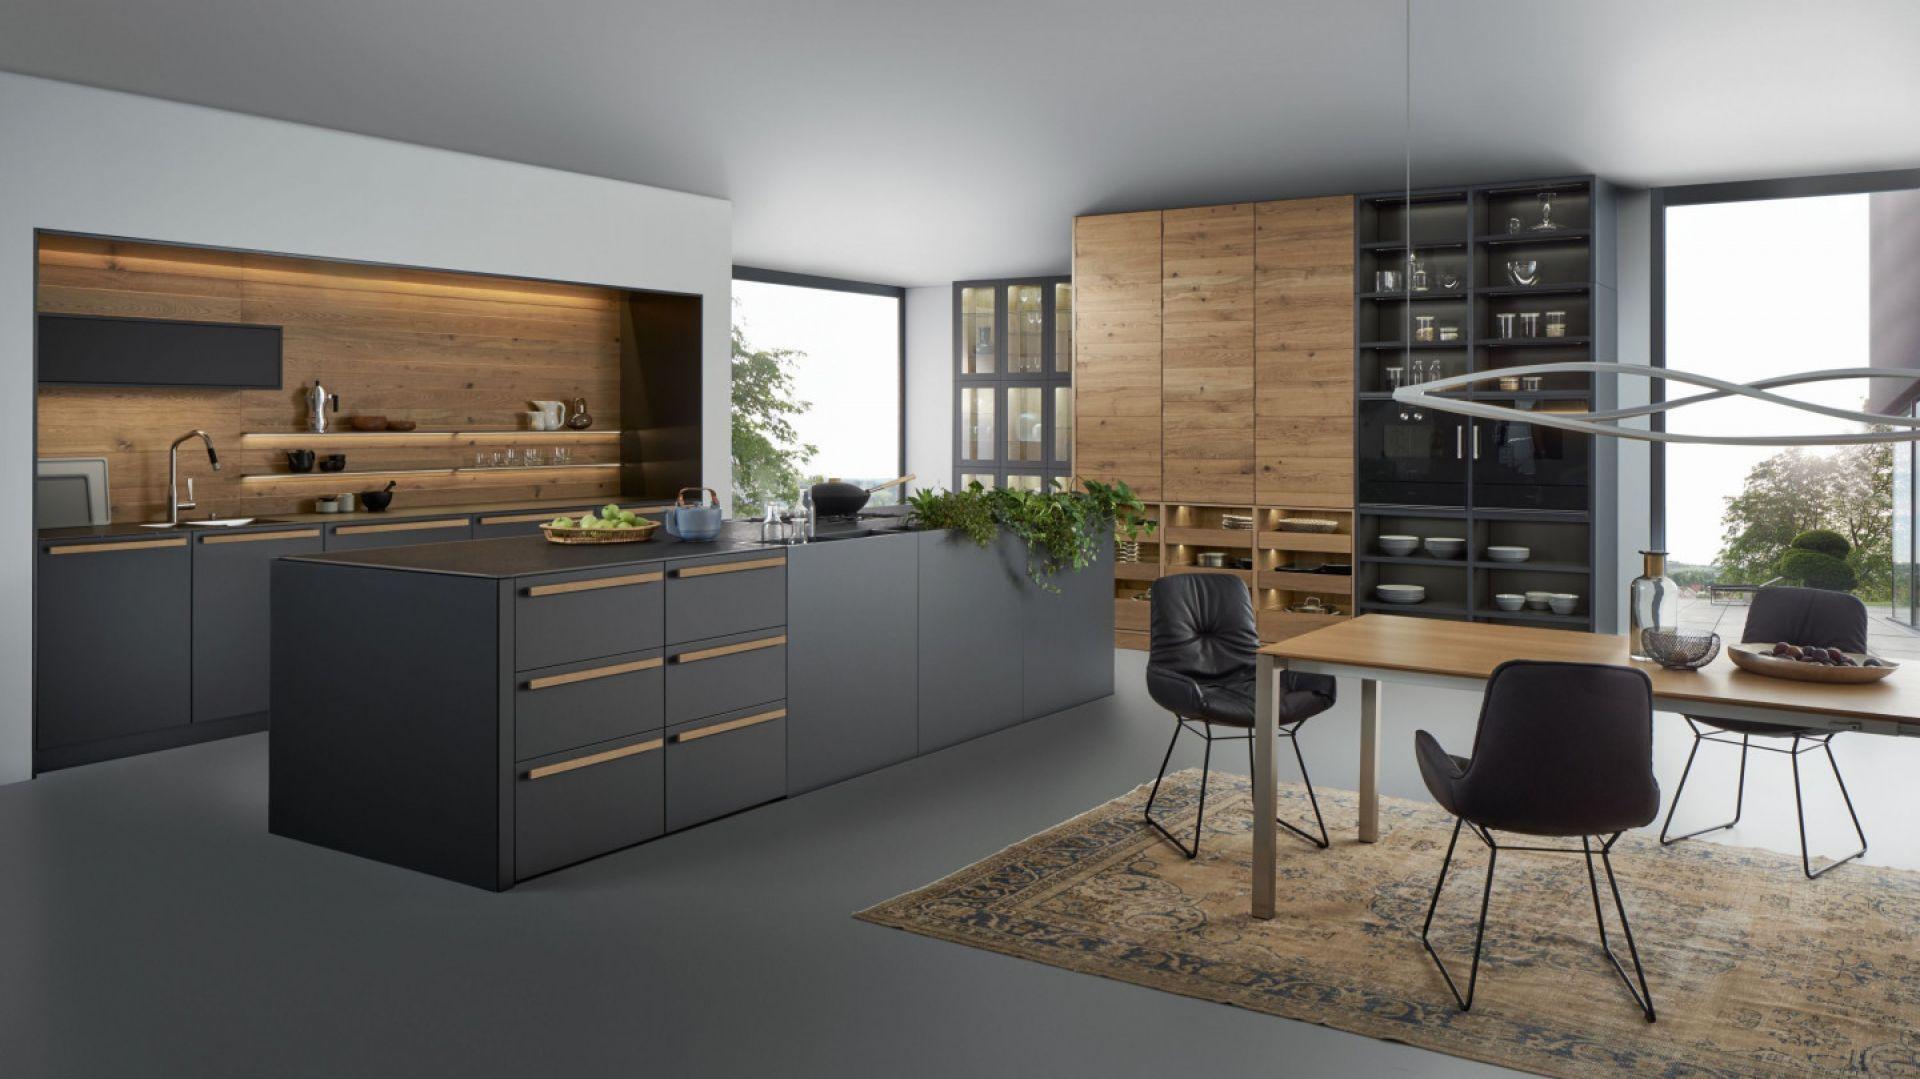 Meble kuchenne dostępne w ofercie firmy Leicht. Fot. Leicht